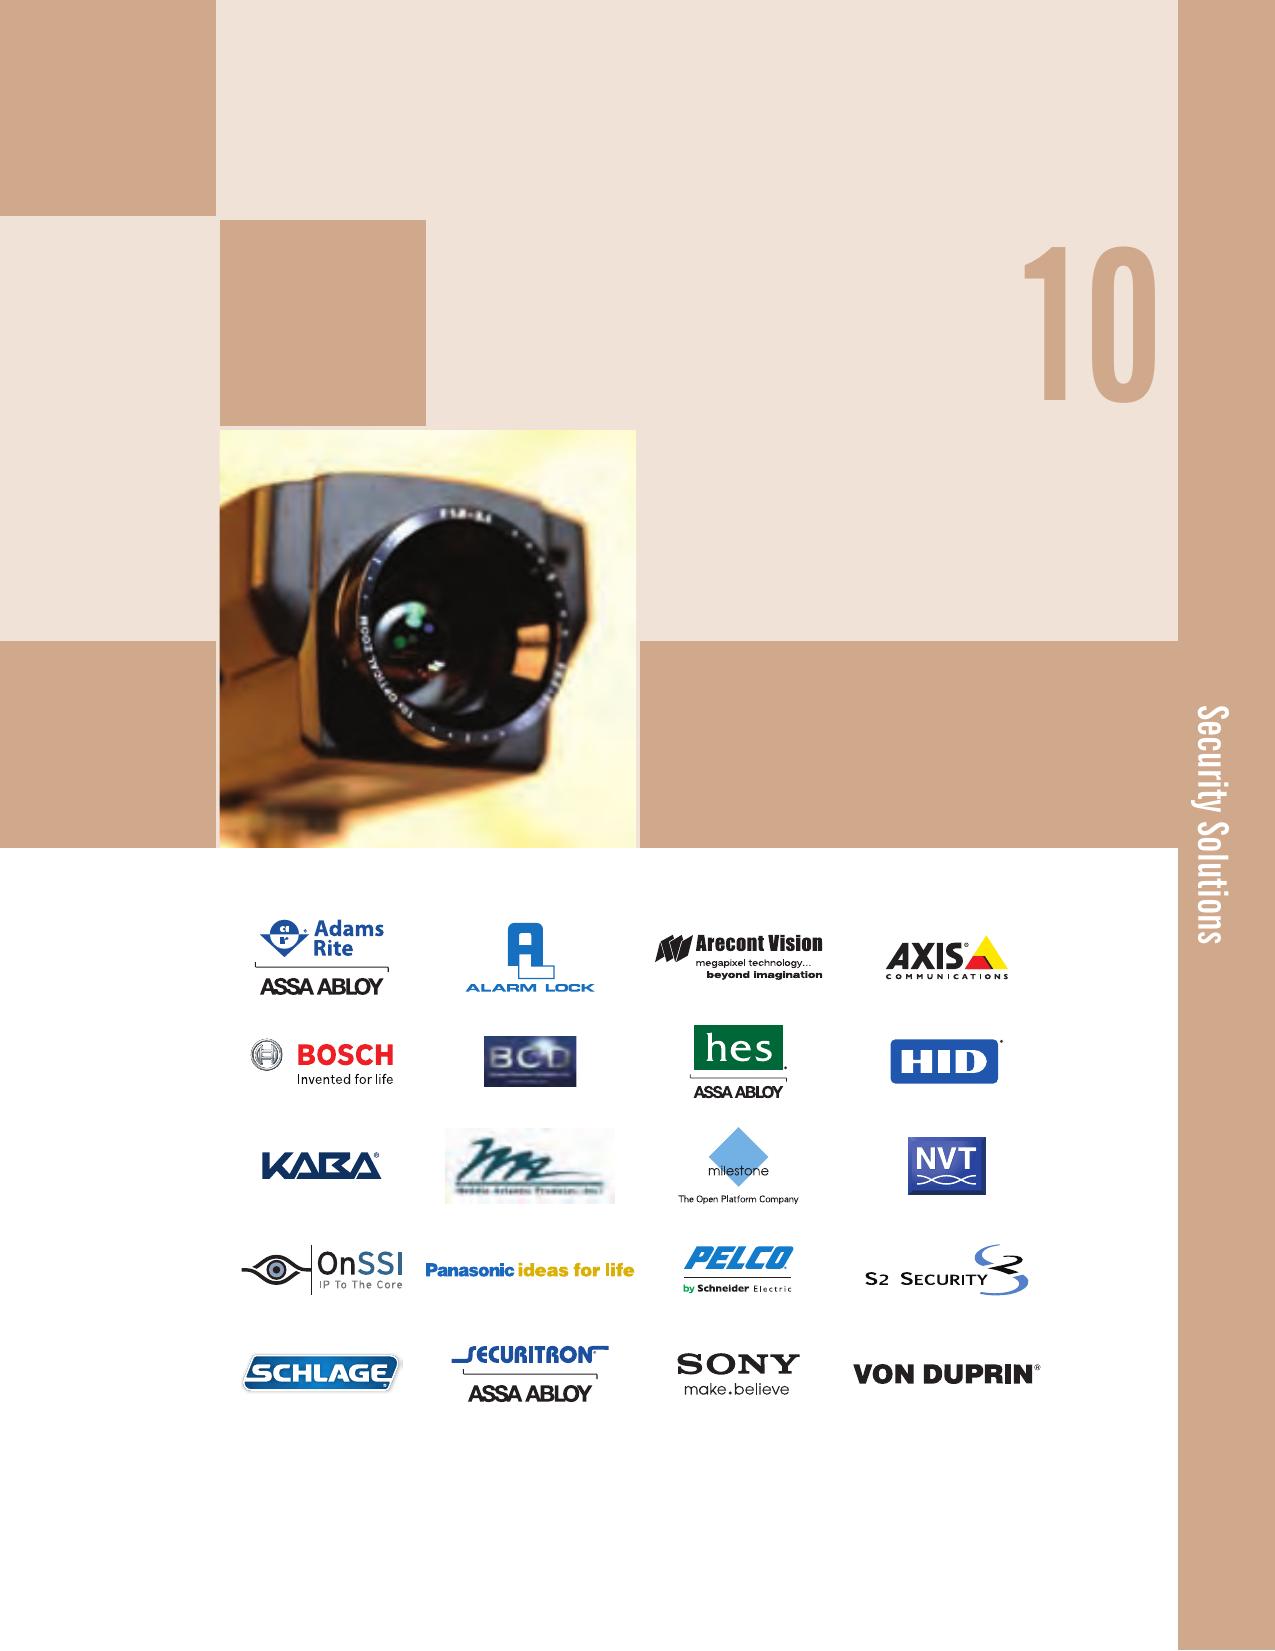 Communication Products Catalog-Section 10 | manualzz com